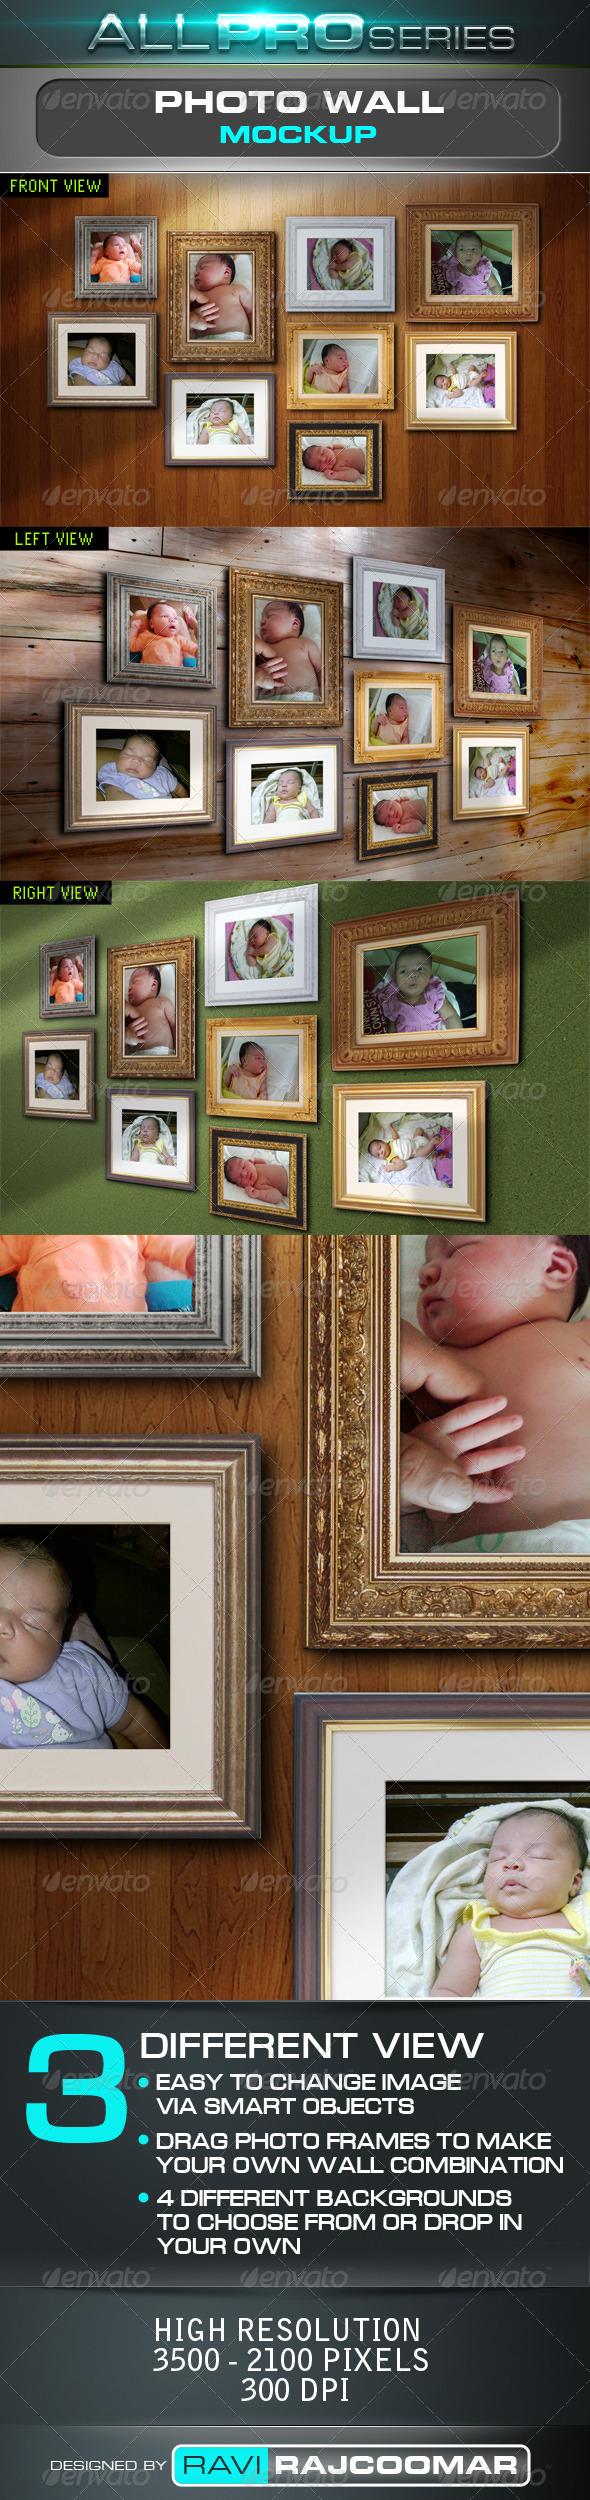 Photo Wall Mockup - Artistic Photo Templates